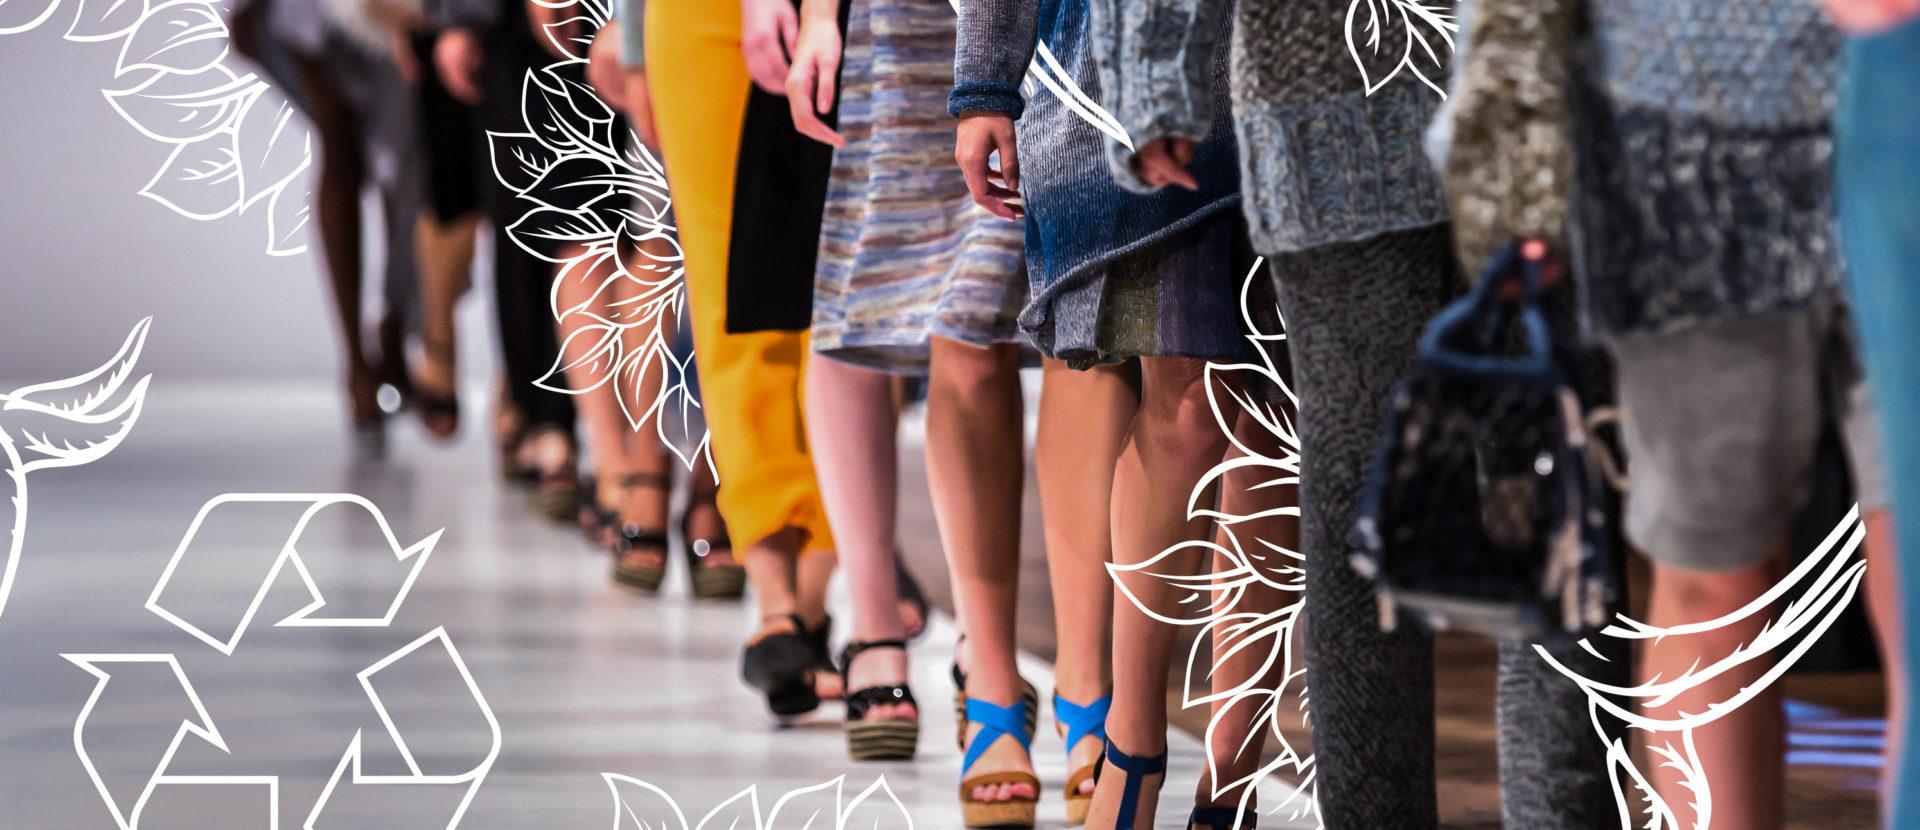 Moda sustentável vem se tornando realidade para a indústria global